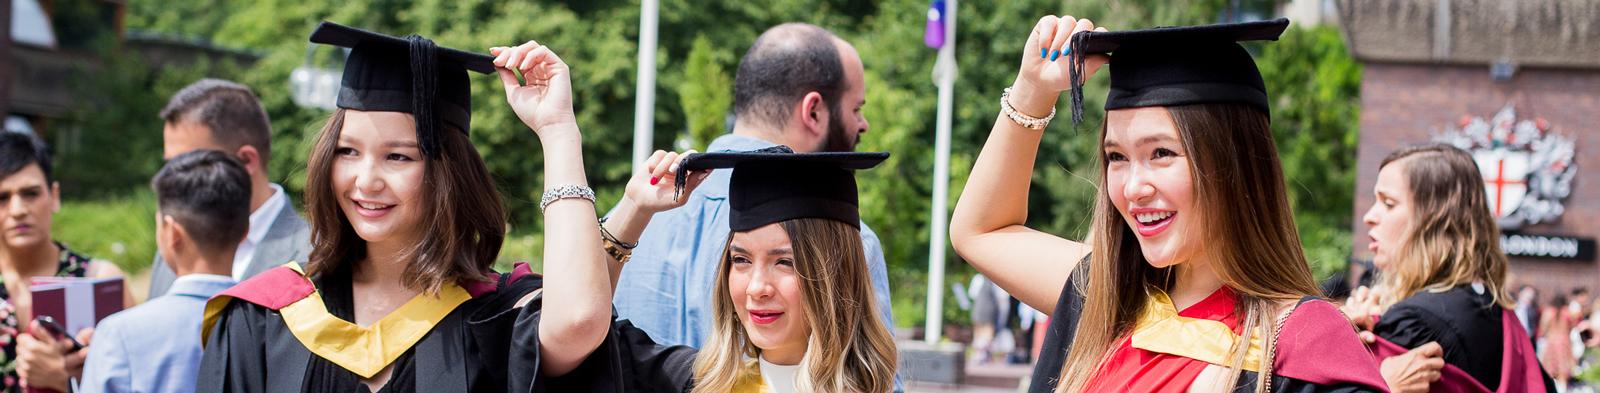 City graduation July 2019